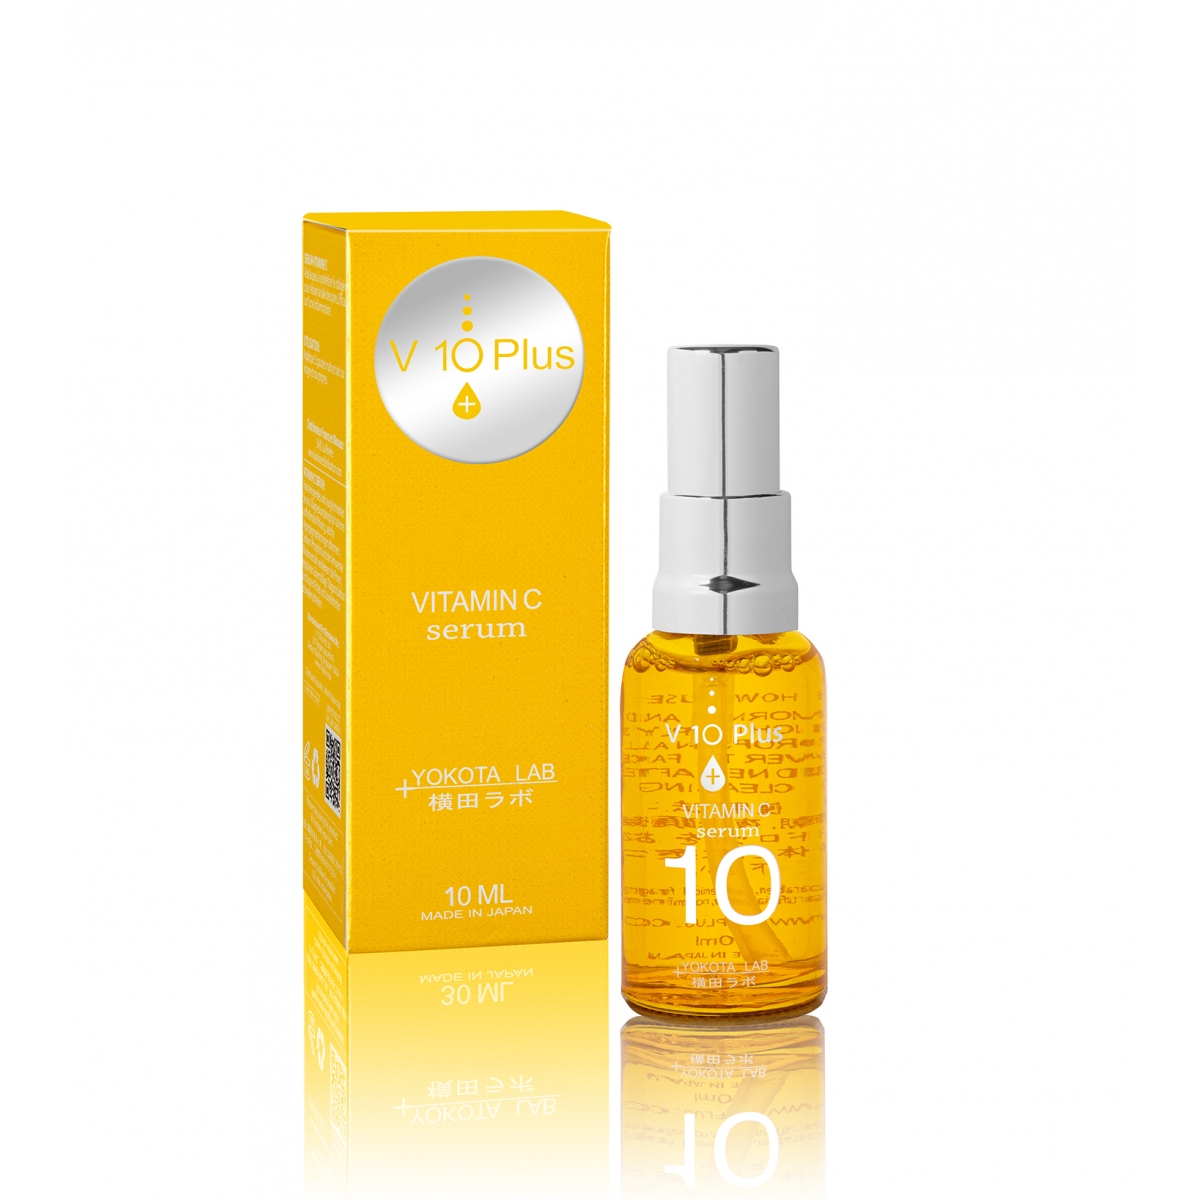 SOIN DU VISAGE - VITAMINE C SERUM V10+ (10 ml)